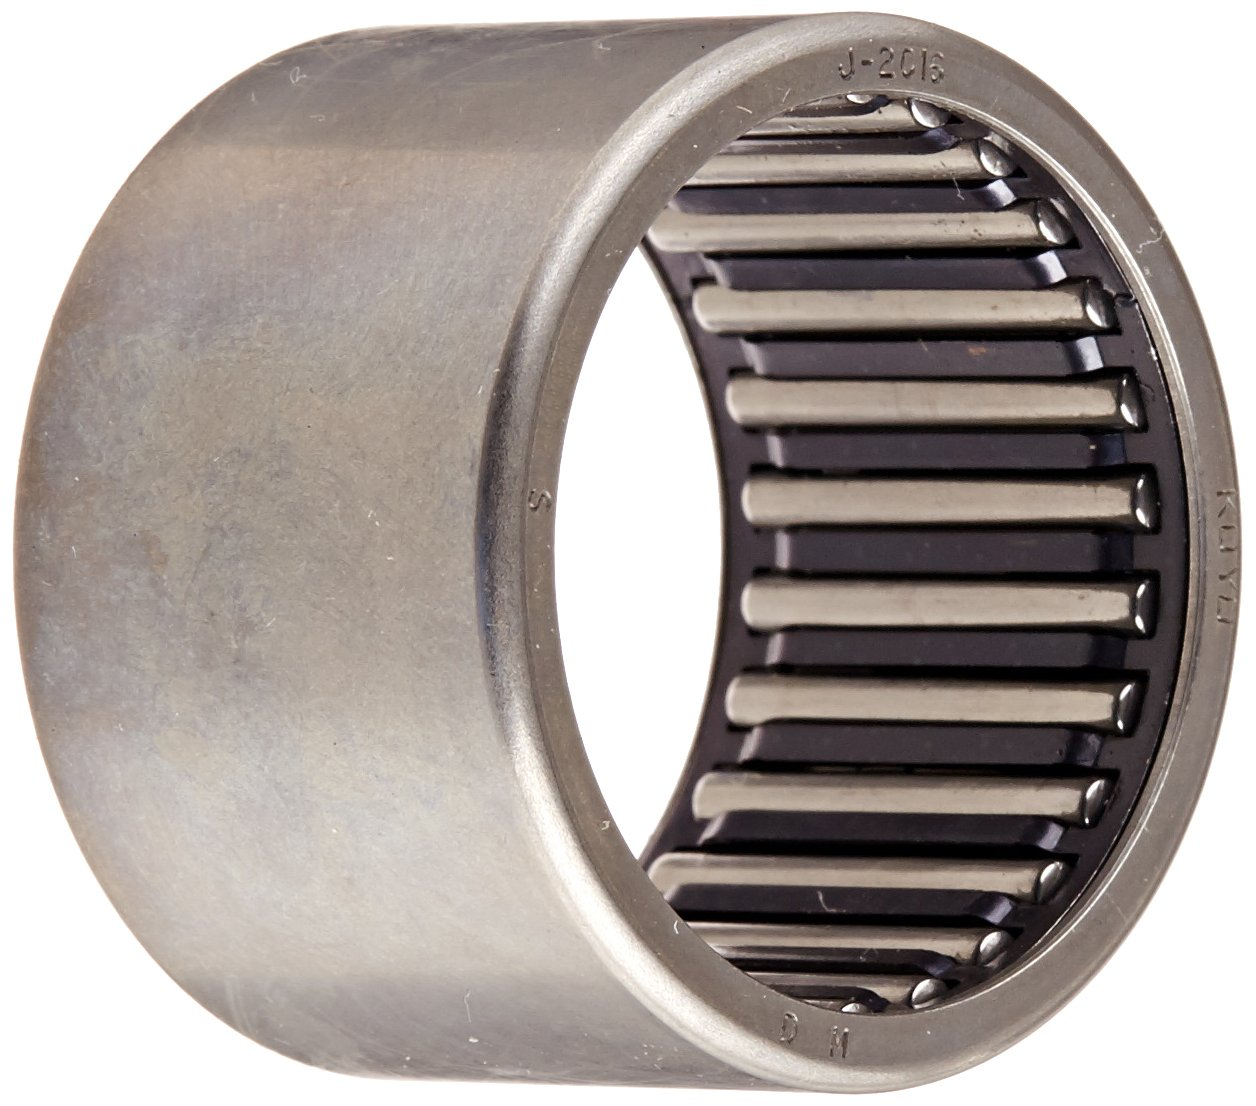 Koyo Sale SALE% OFF J-2016 Needle Roller Bearingd Open Cup Cage Steel Drawn Sale SALE% OFF